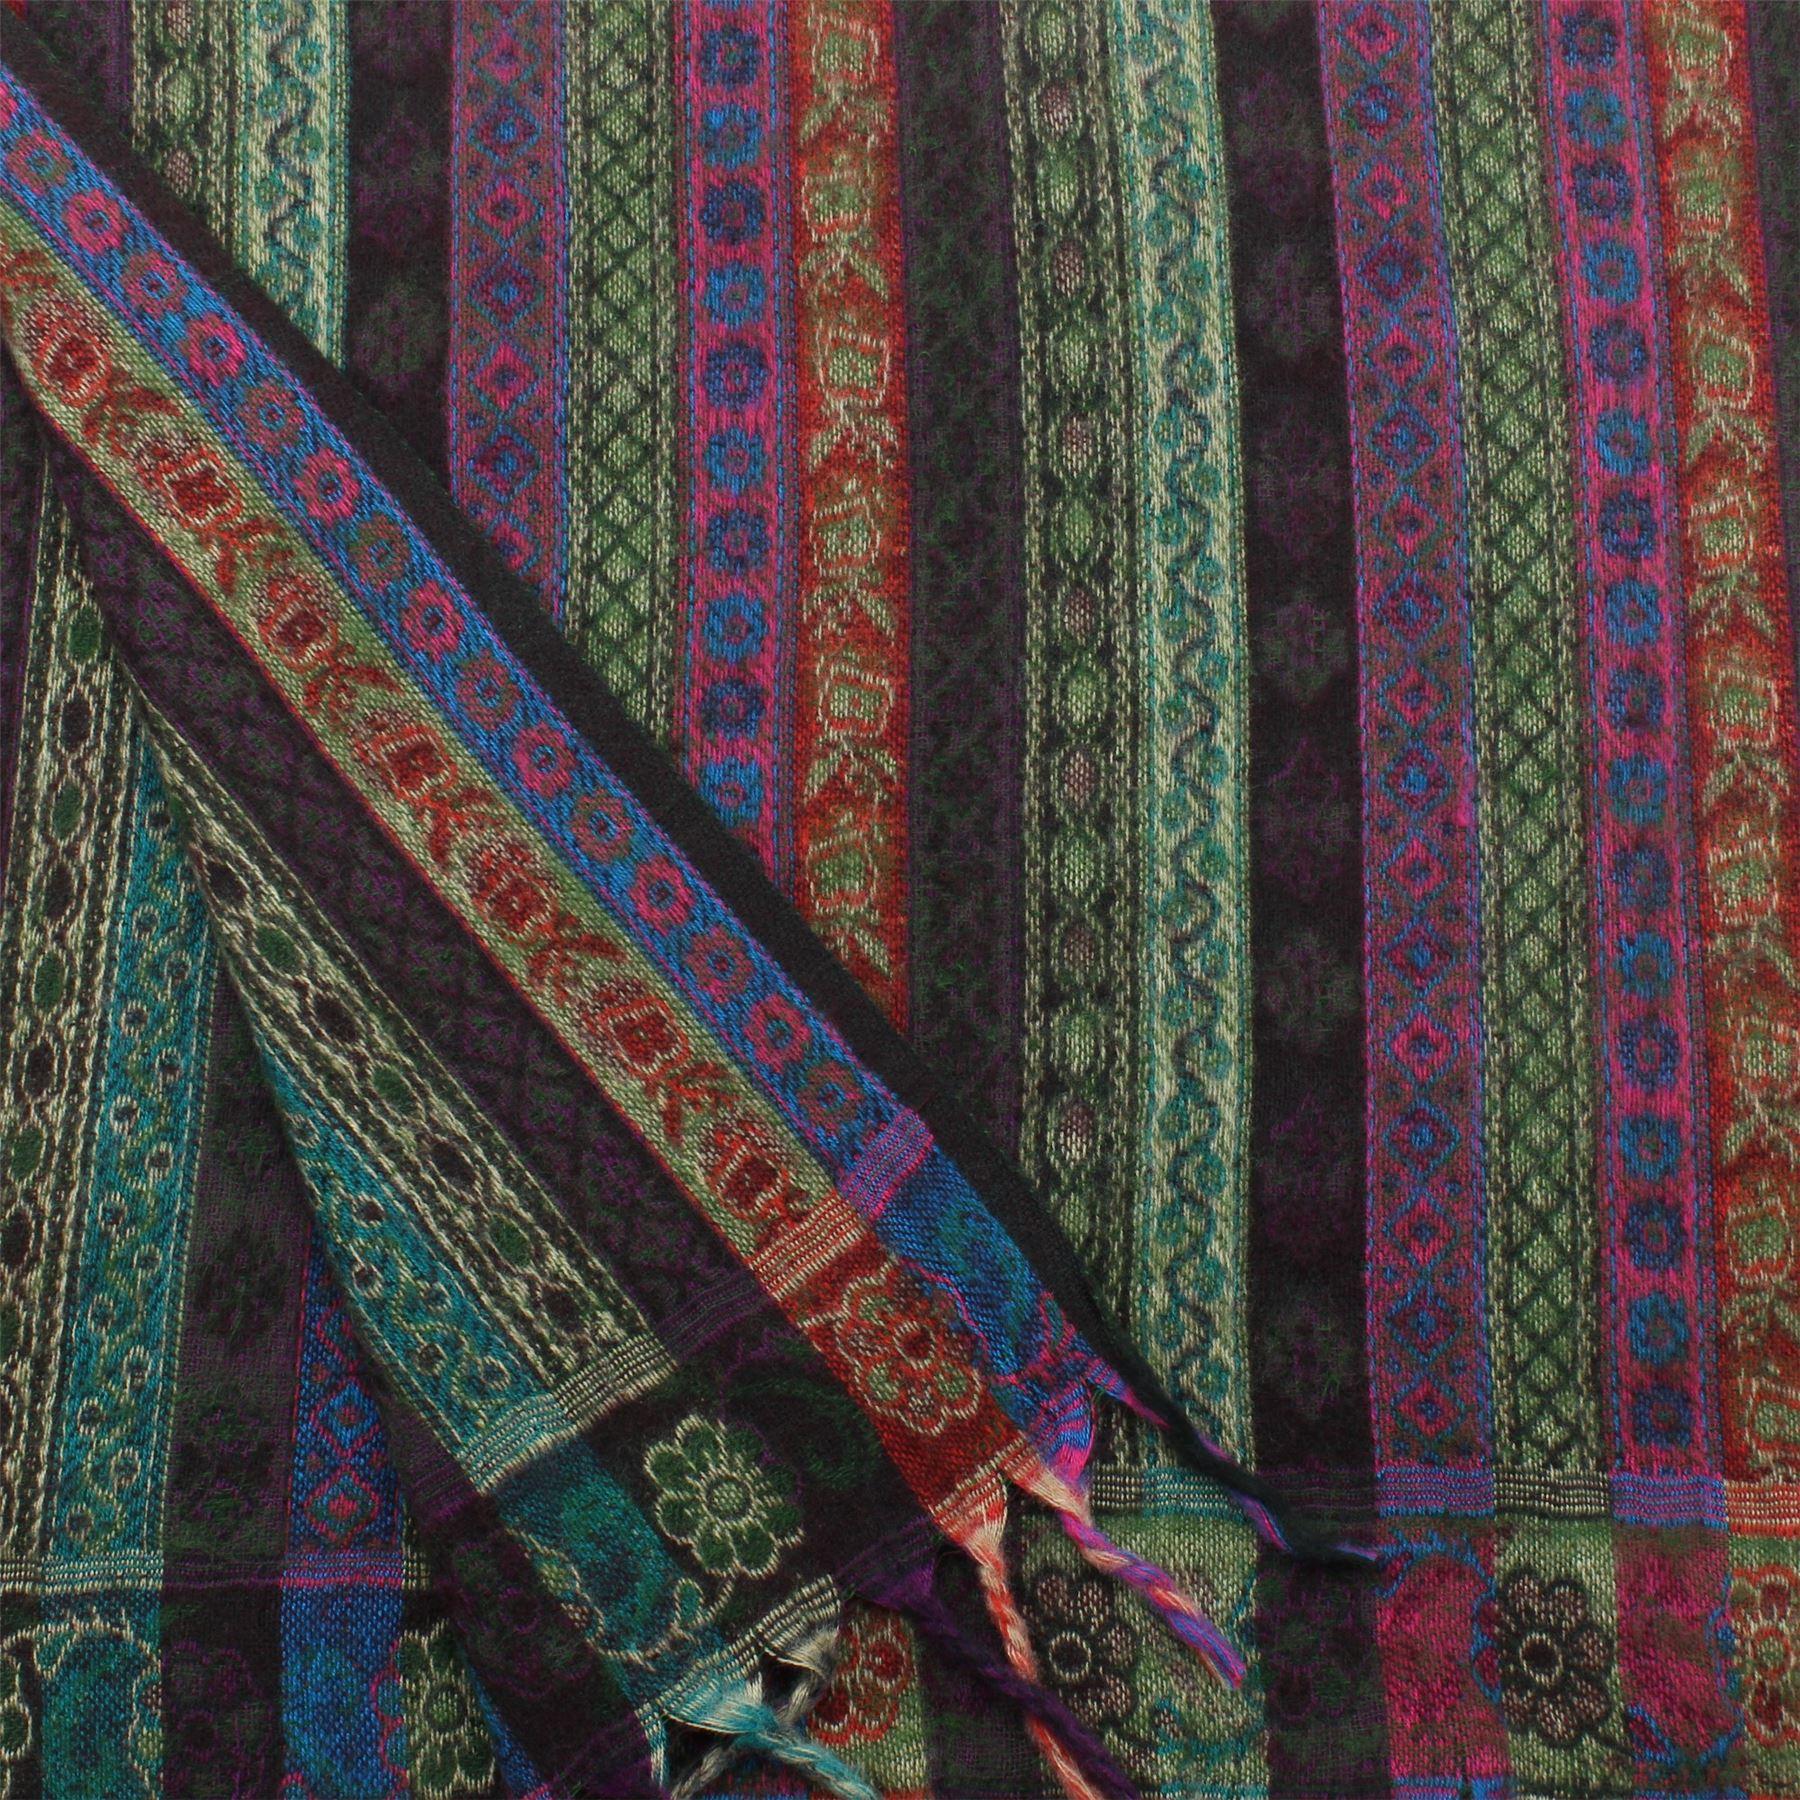 Acrylic-Wool-Blanket-Shawl-Wrap-Throw-Finest-Softest-India-Stripe-Paisley-Travel thumbnail 30